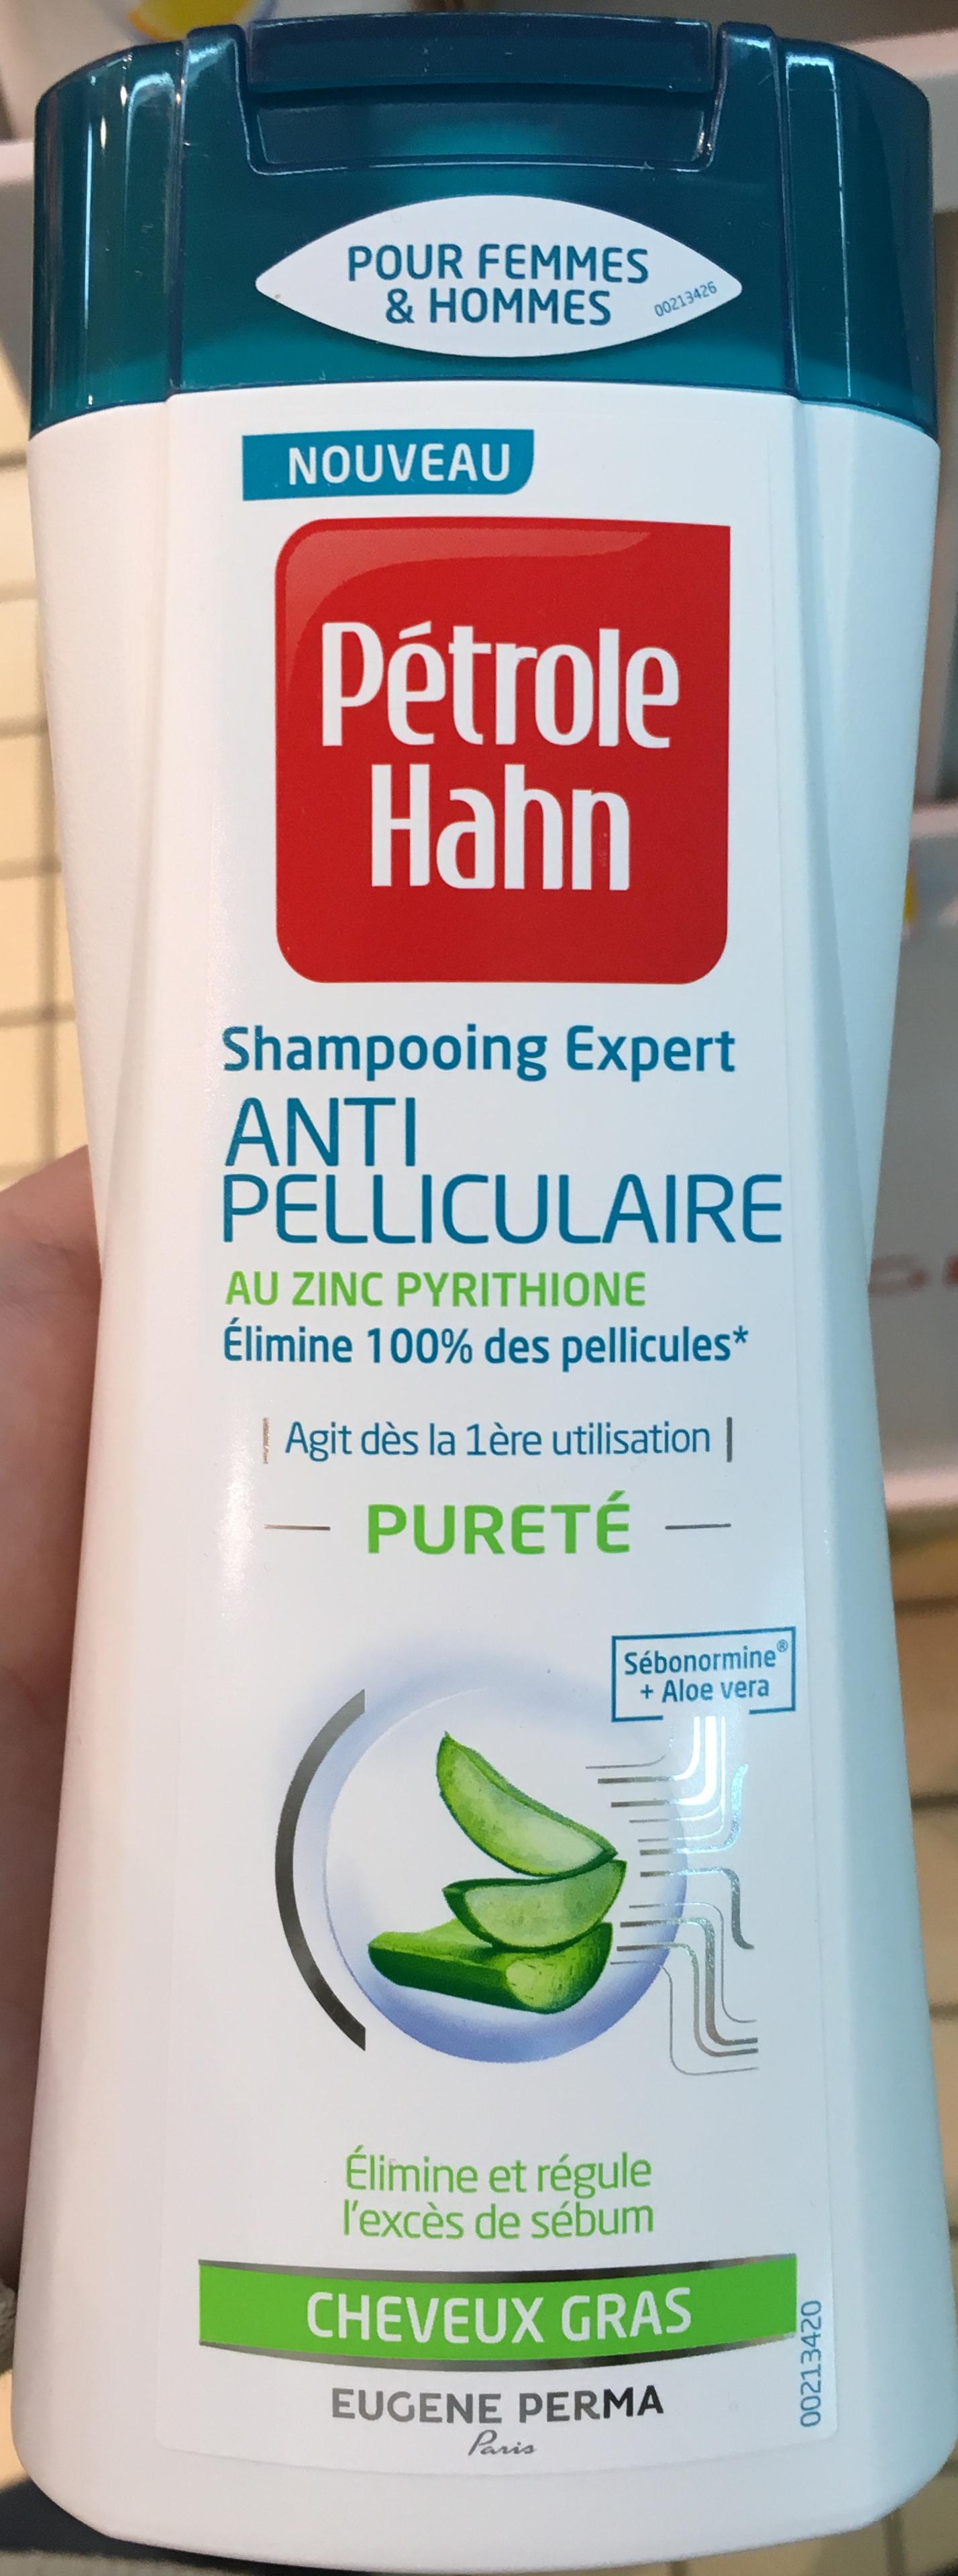 Shampooing expert anti pelliculaire Pureté - Product - fr